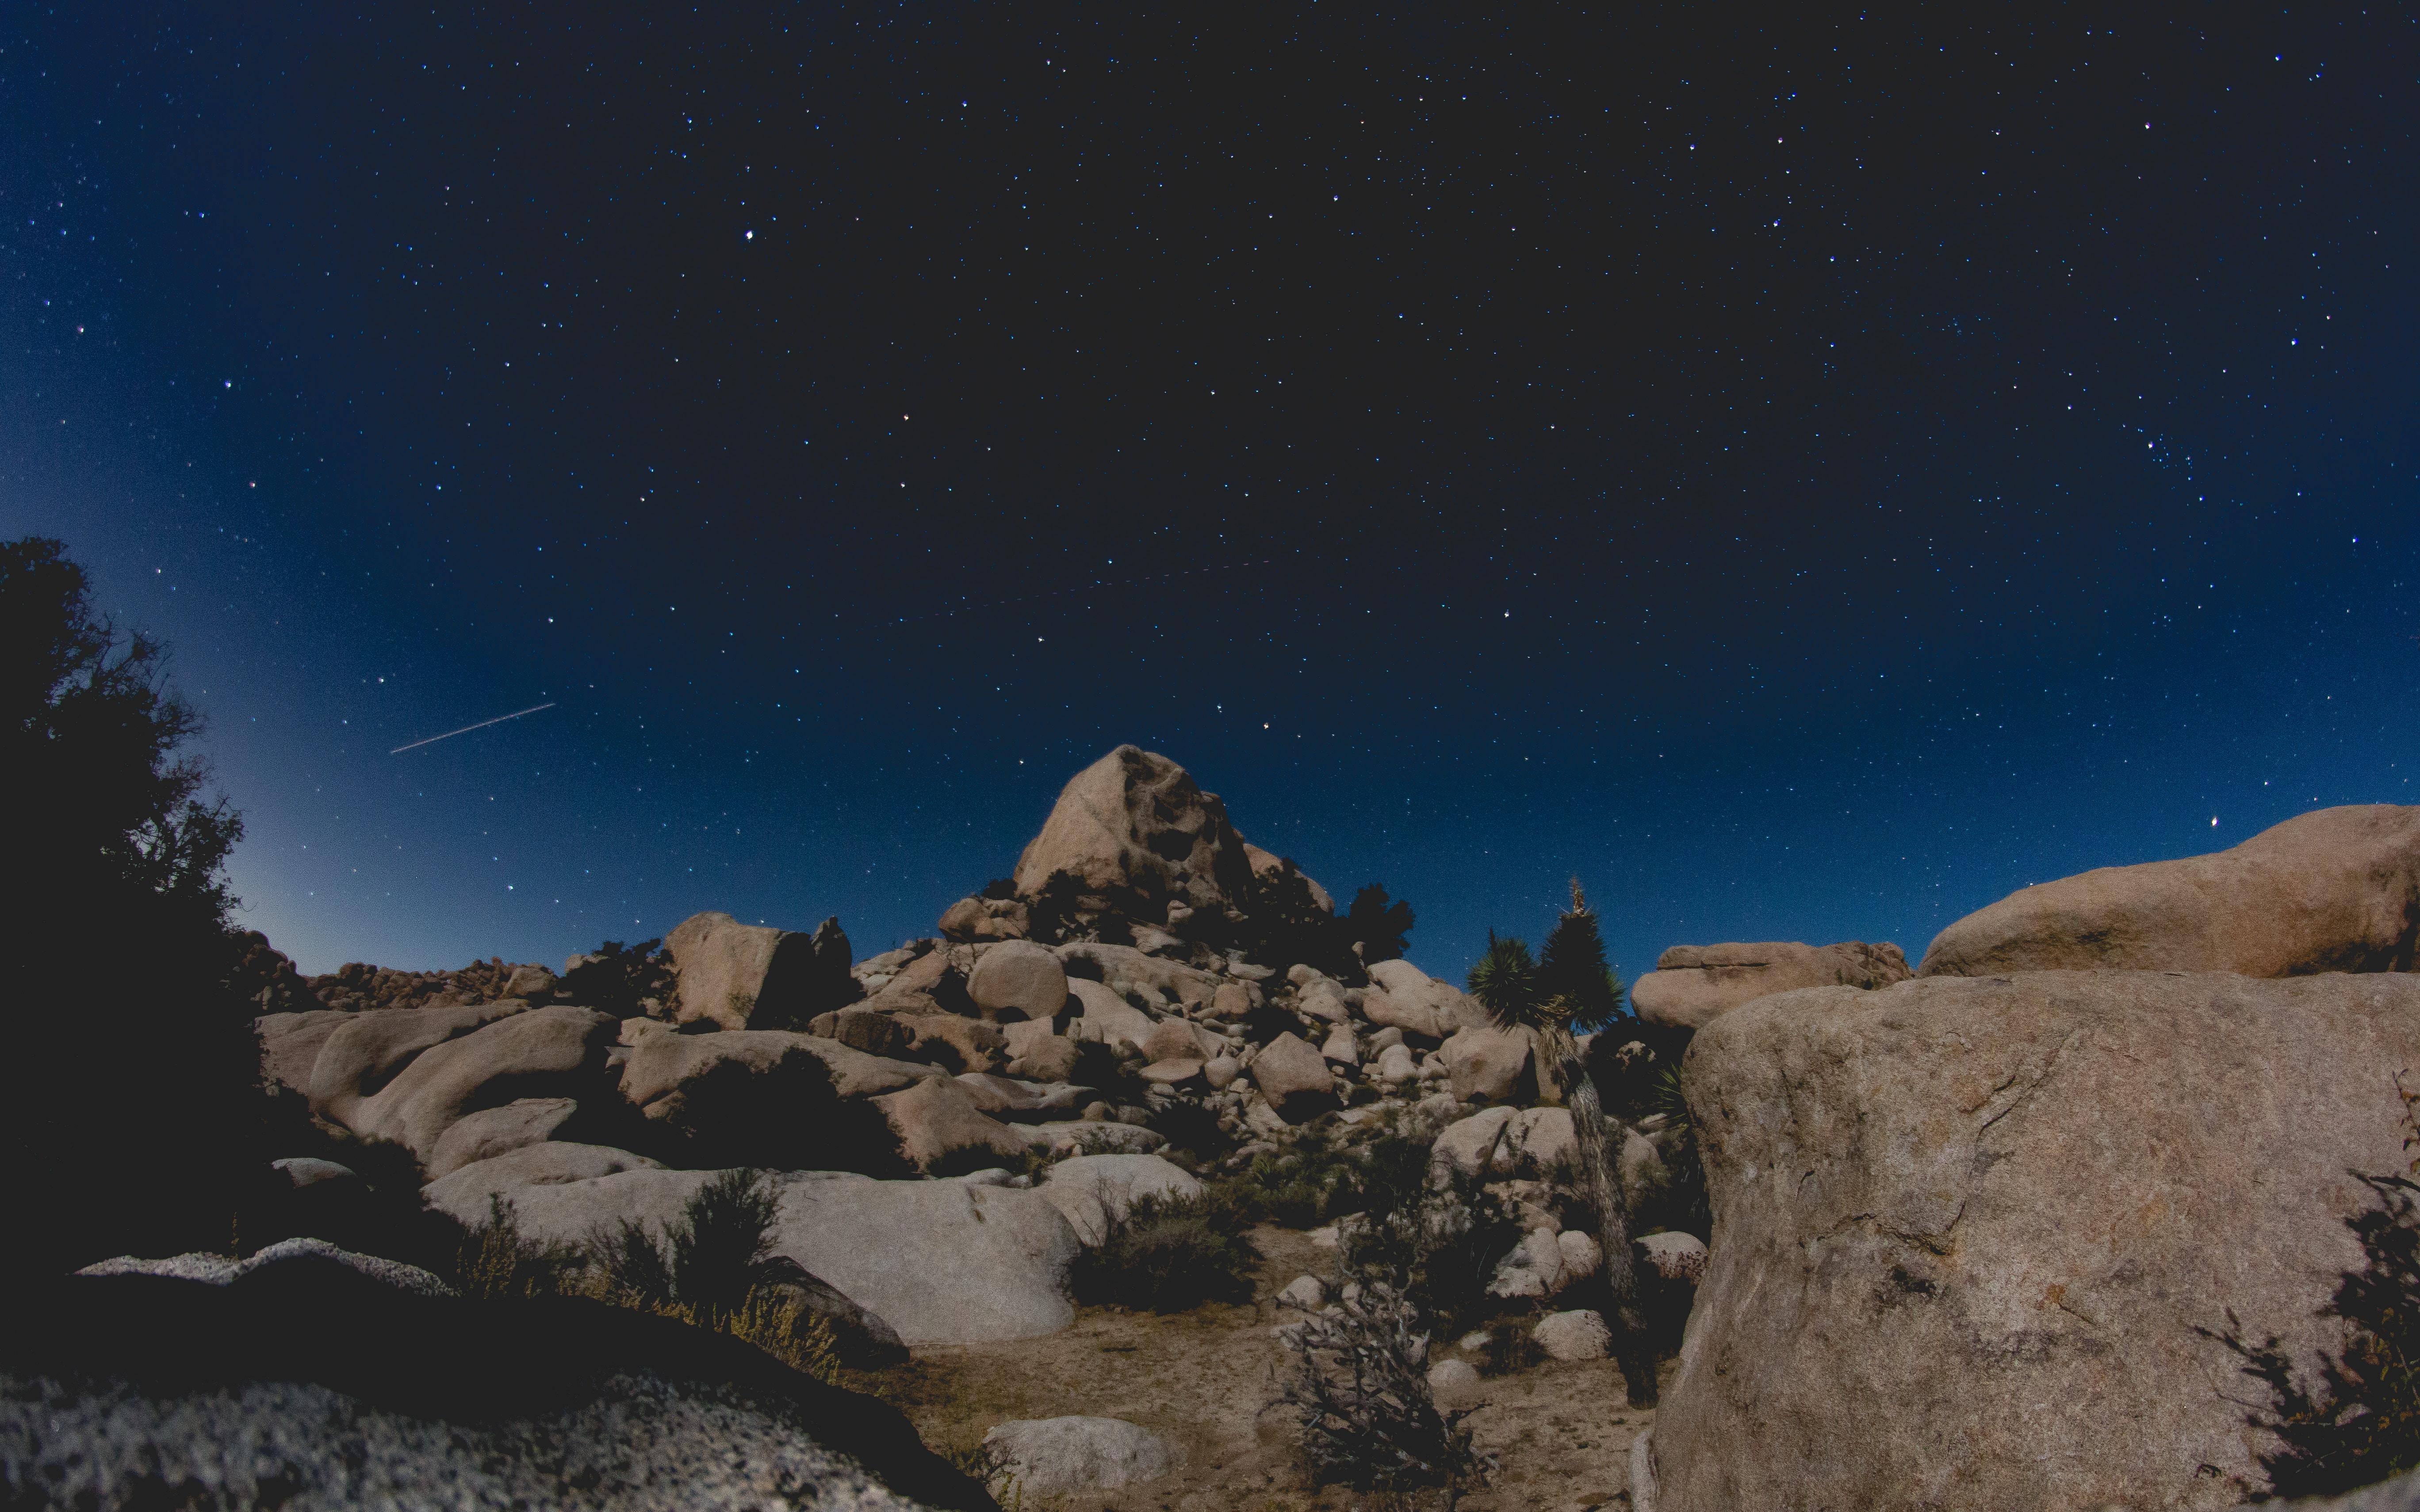 brown rock formation under blue night sky